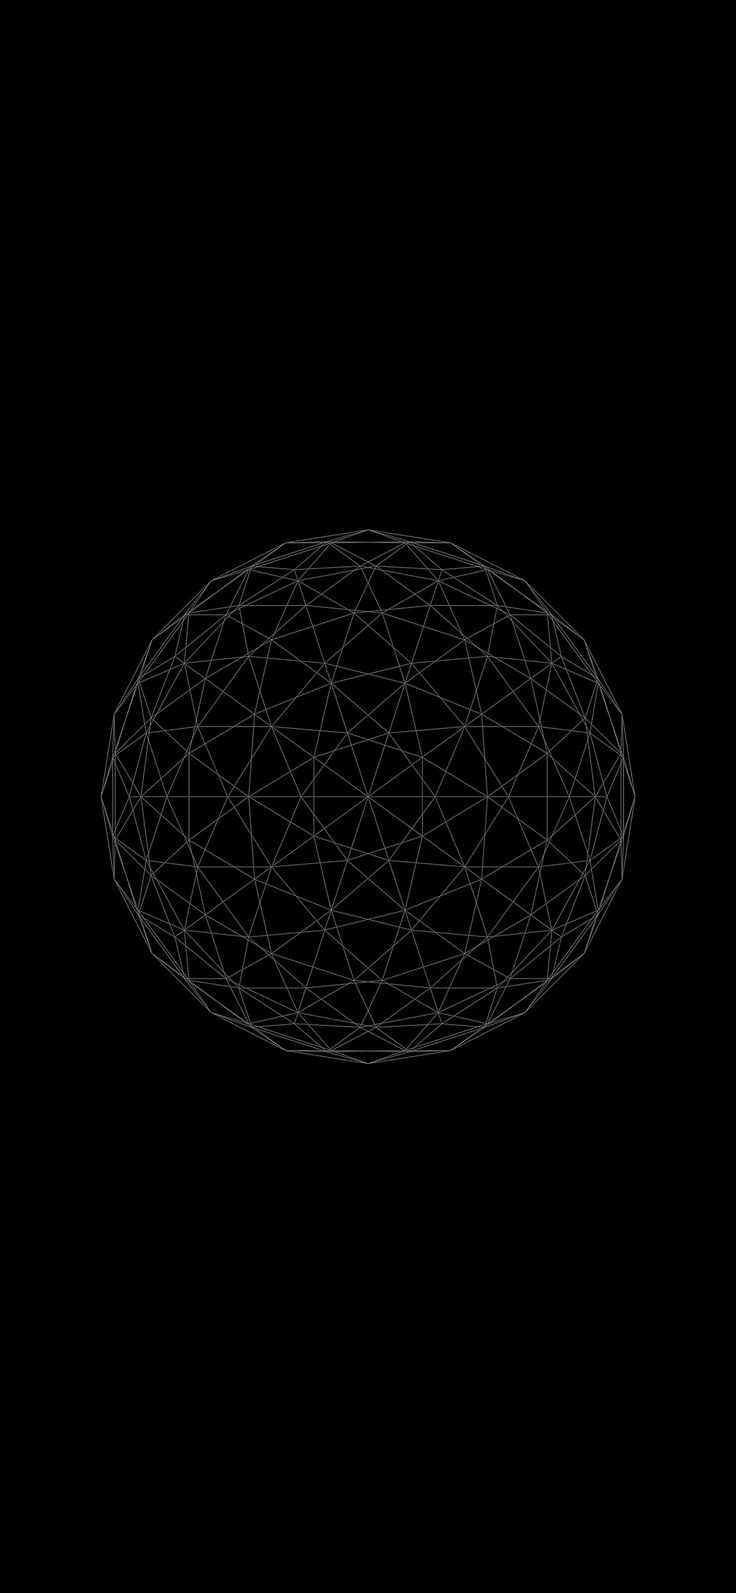 Iphone X Wallpaper Ve32 Line Abstract Circle 3d Art Via